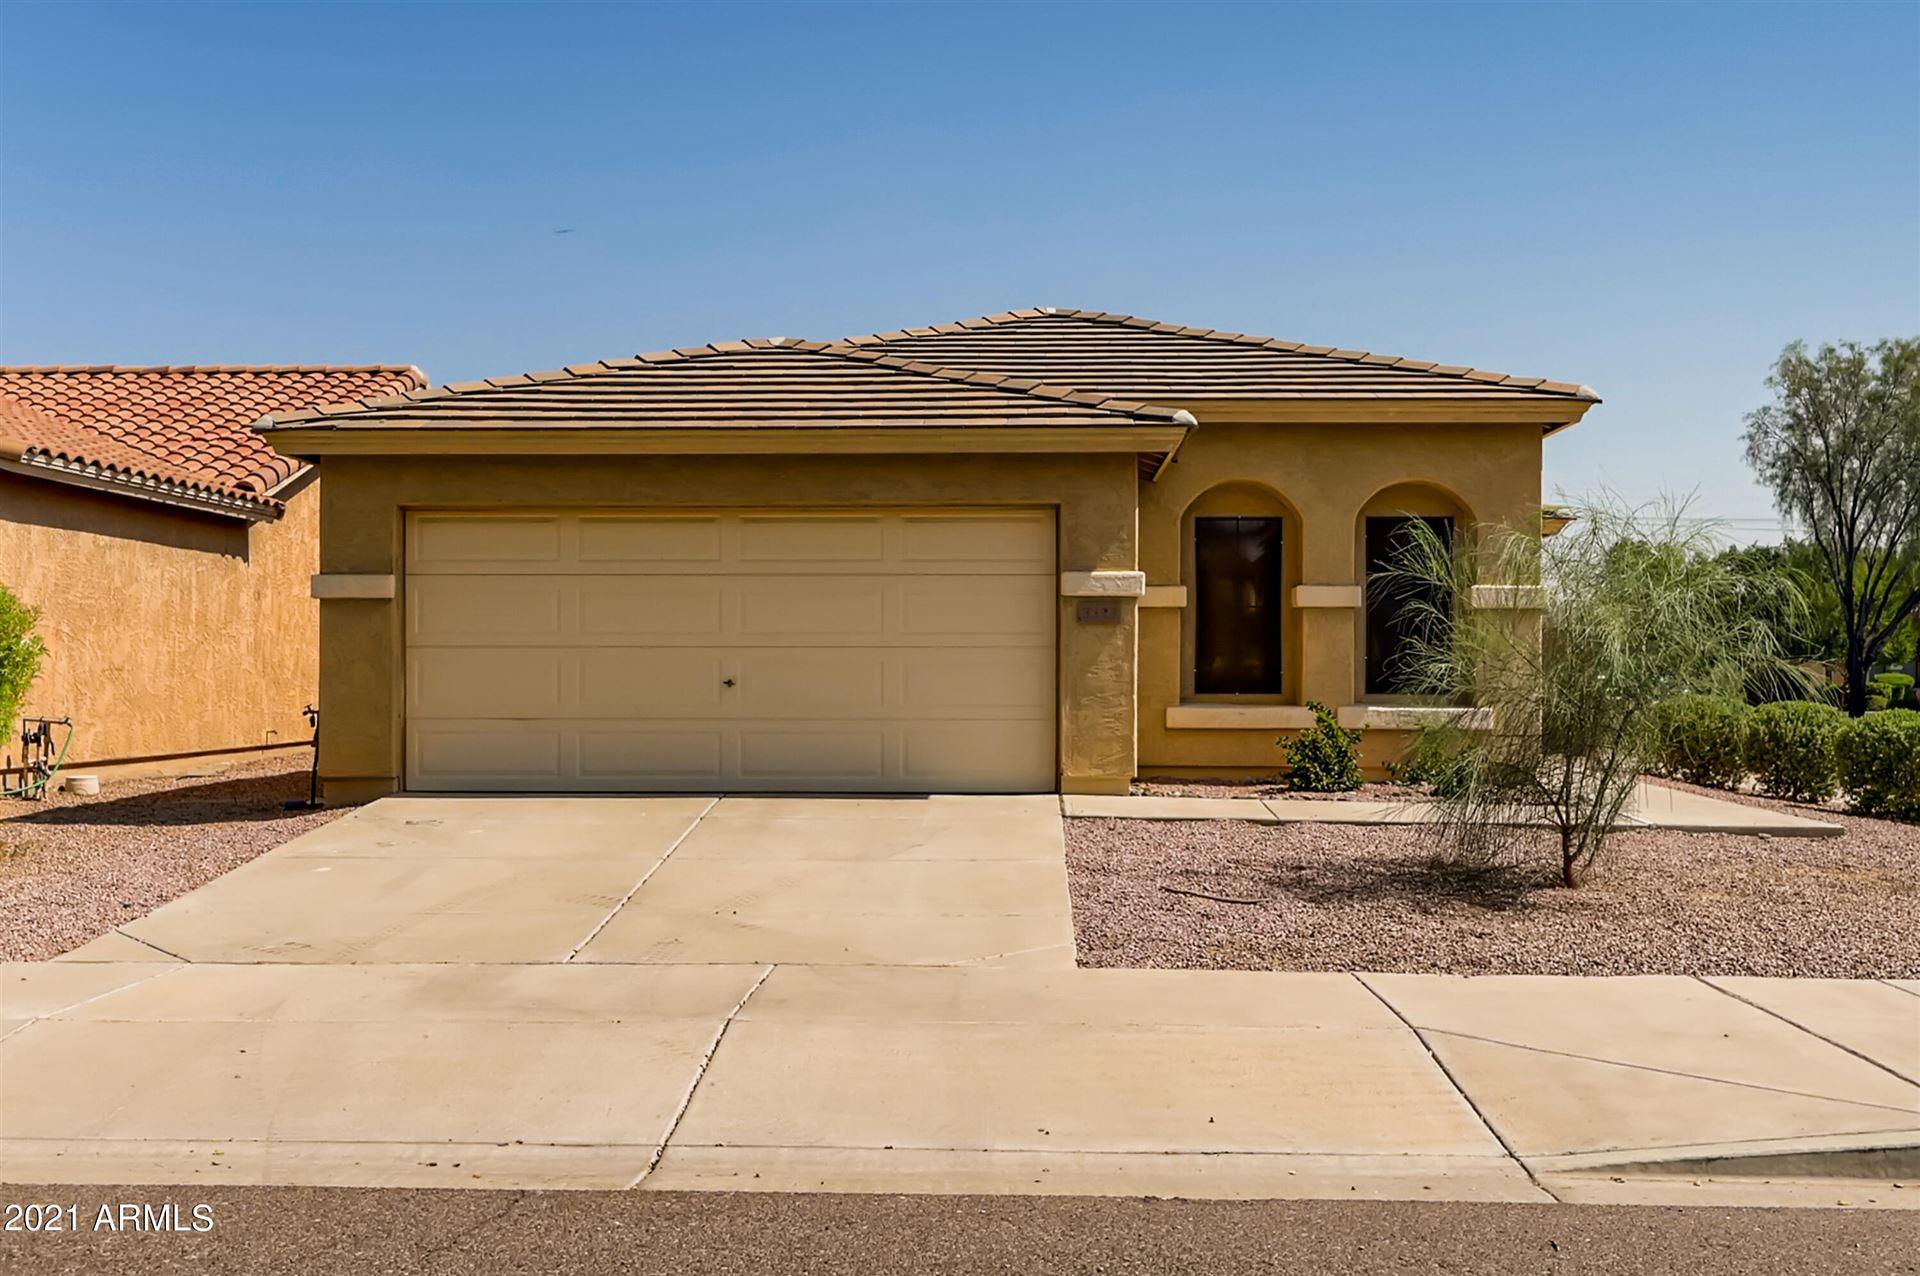 3323 S 80TH Avenue, Phoenix, AZ 85043 - MLS#: 6292962